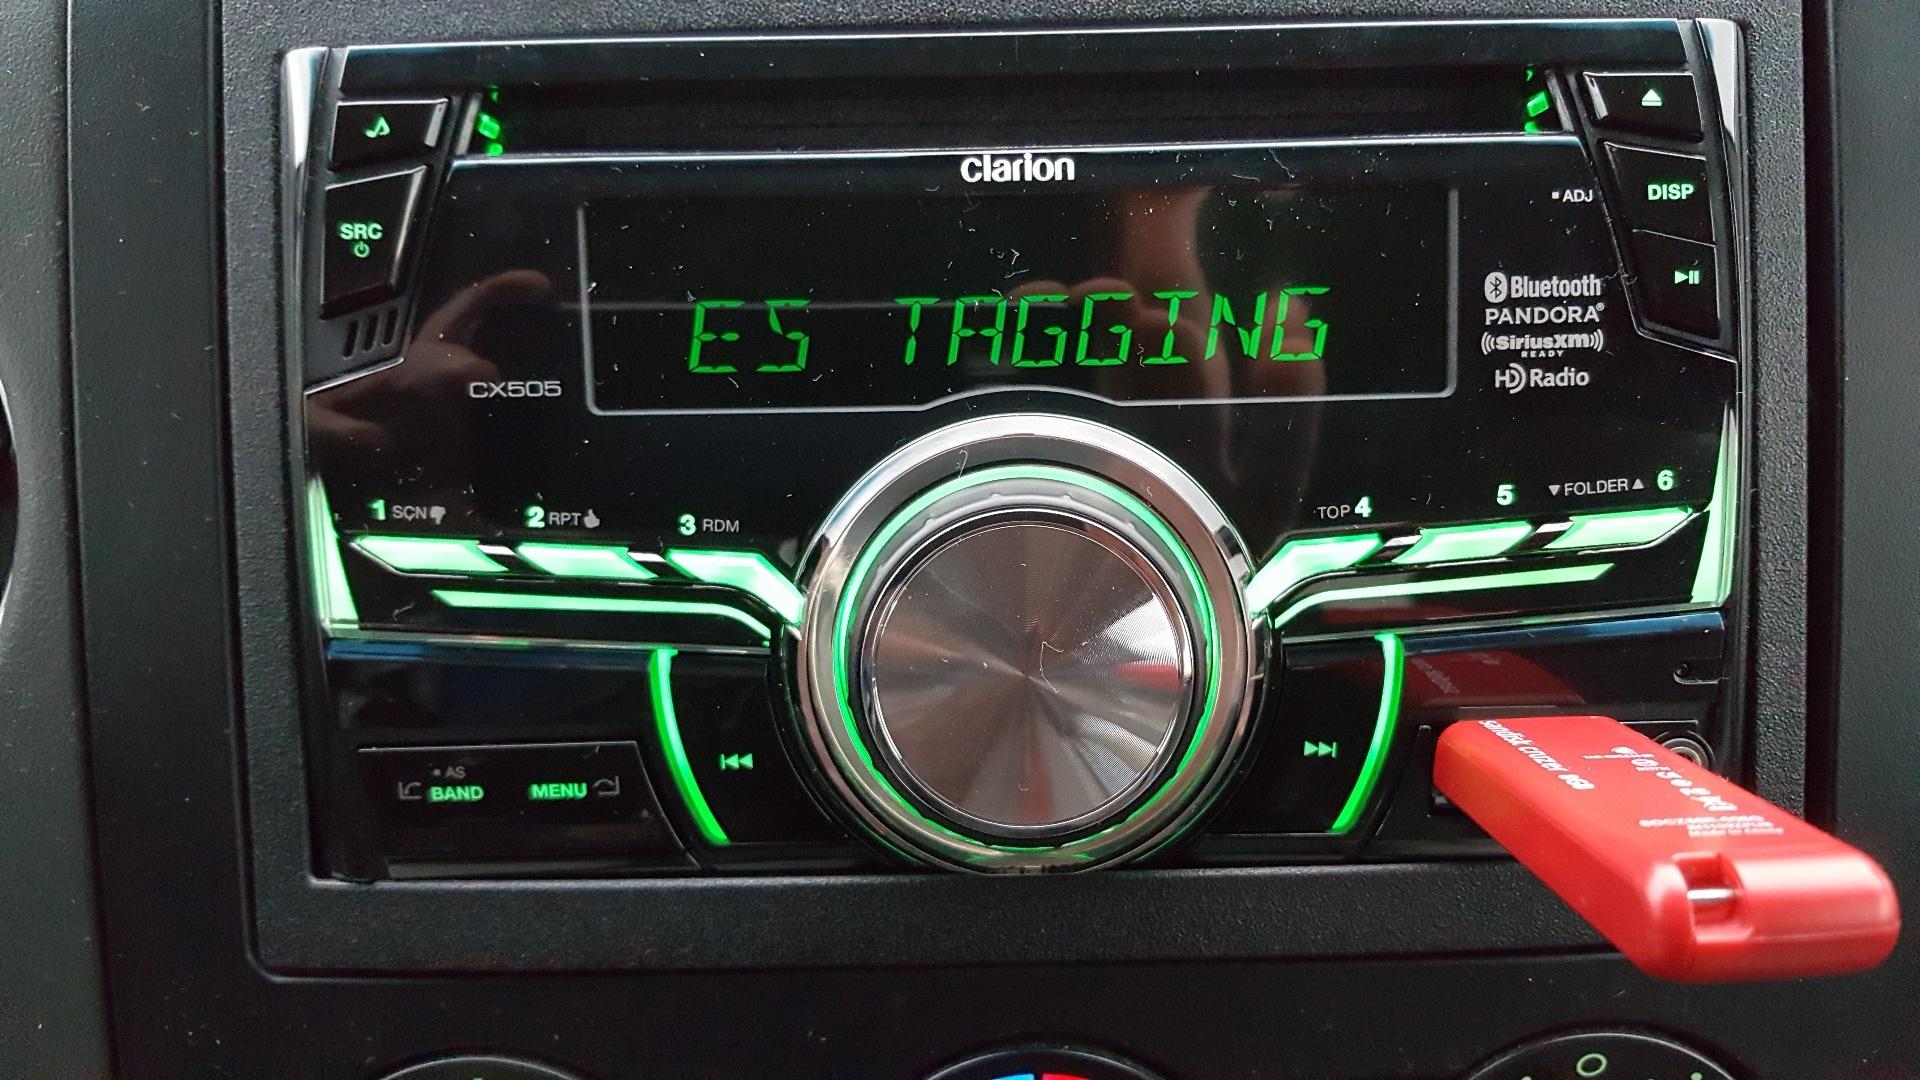 Clarion CX505 CD receiver at Crutchfield